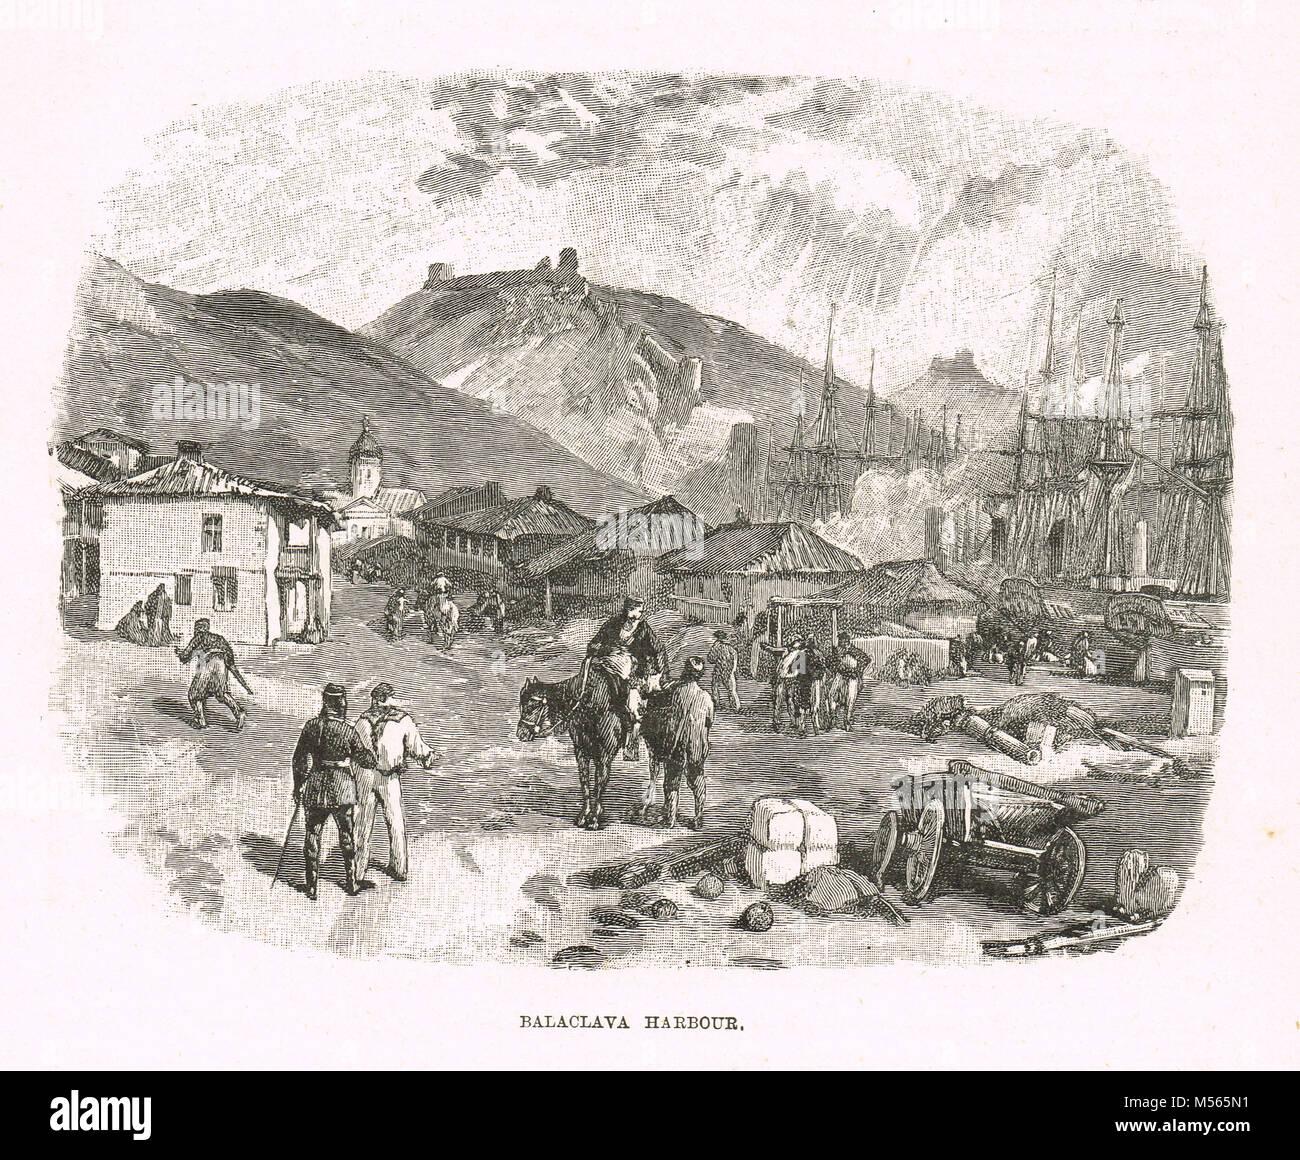 Balaclava harbour, 1854, Crimean war - Stock Image